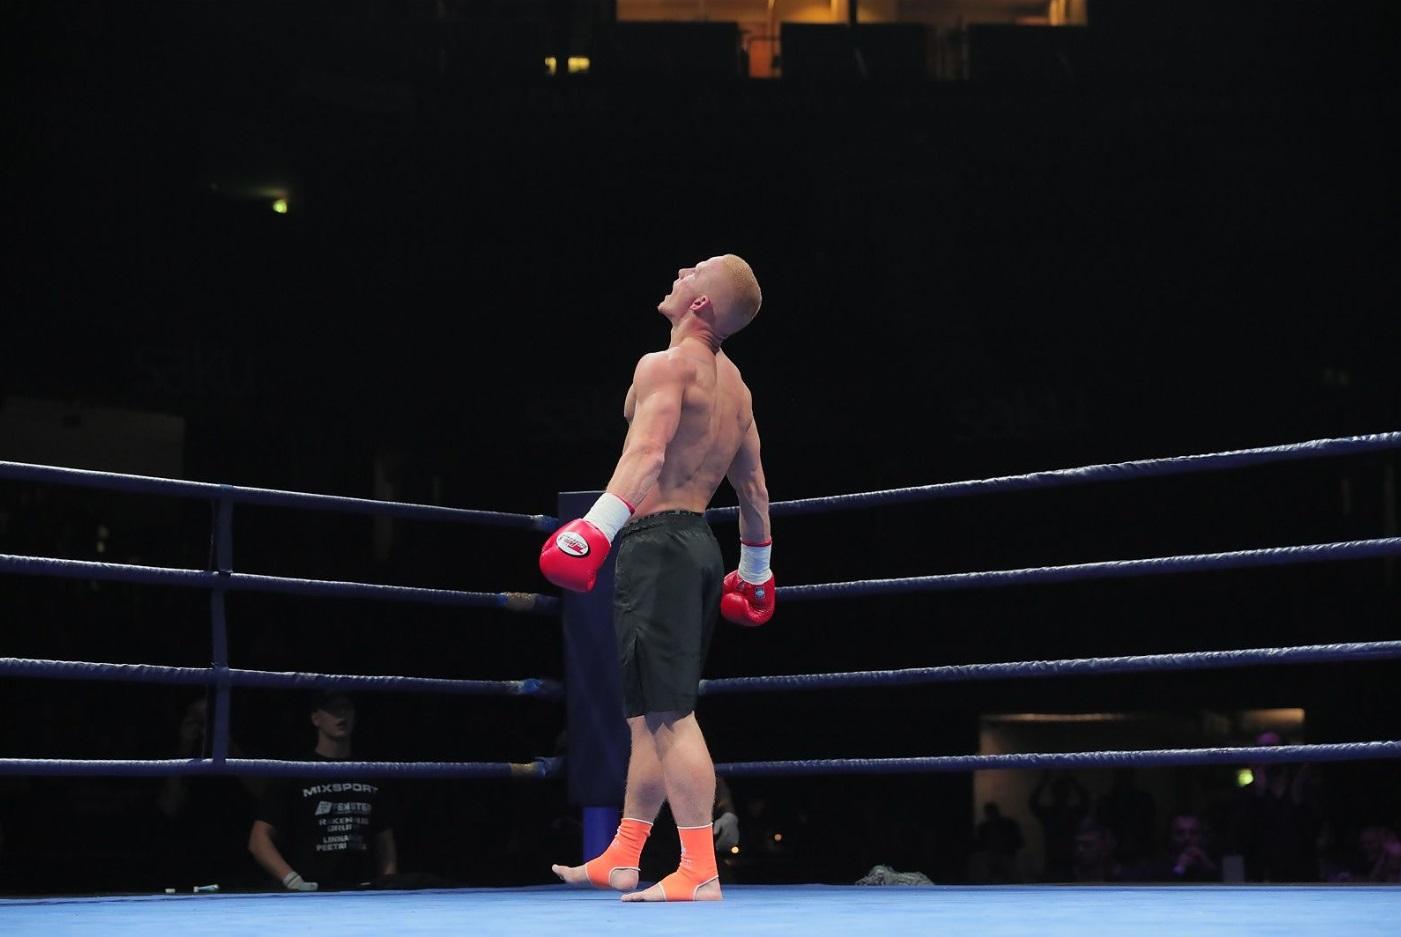 hENDRIK tHEMAS FIGHTS